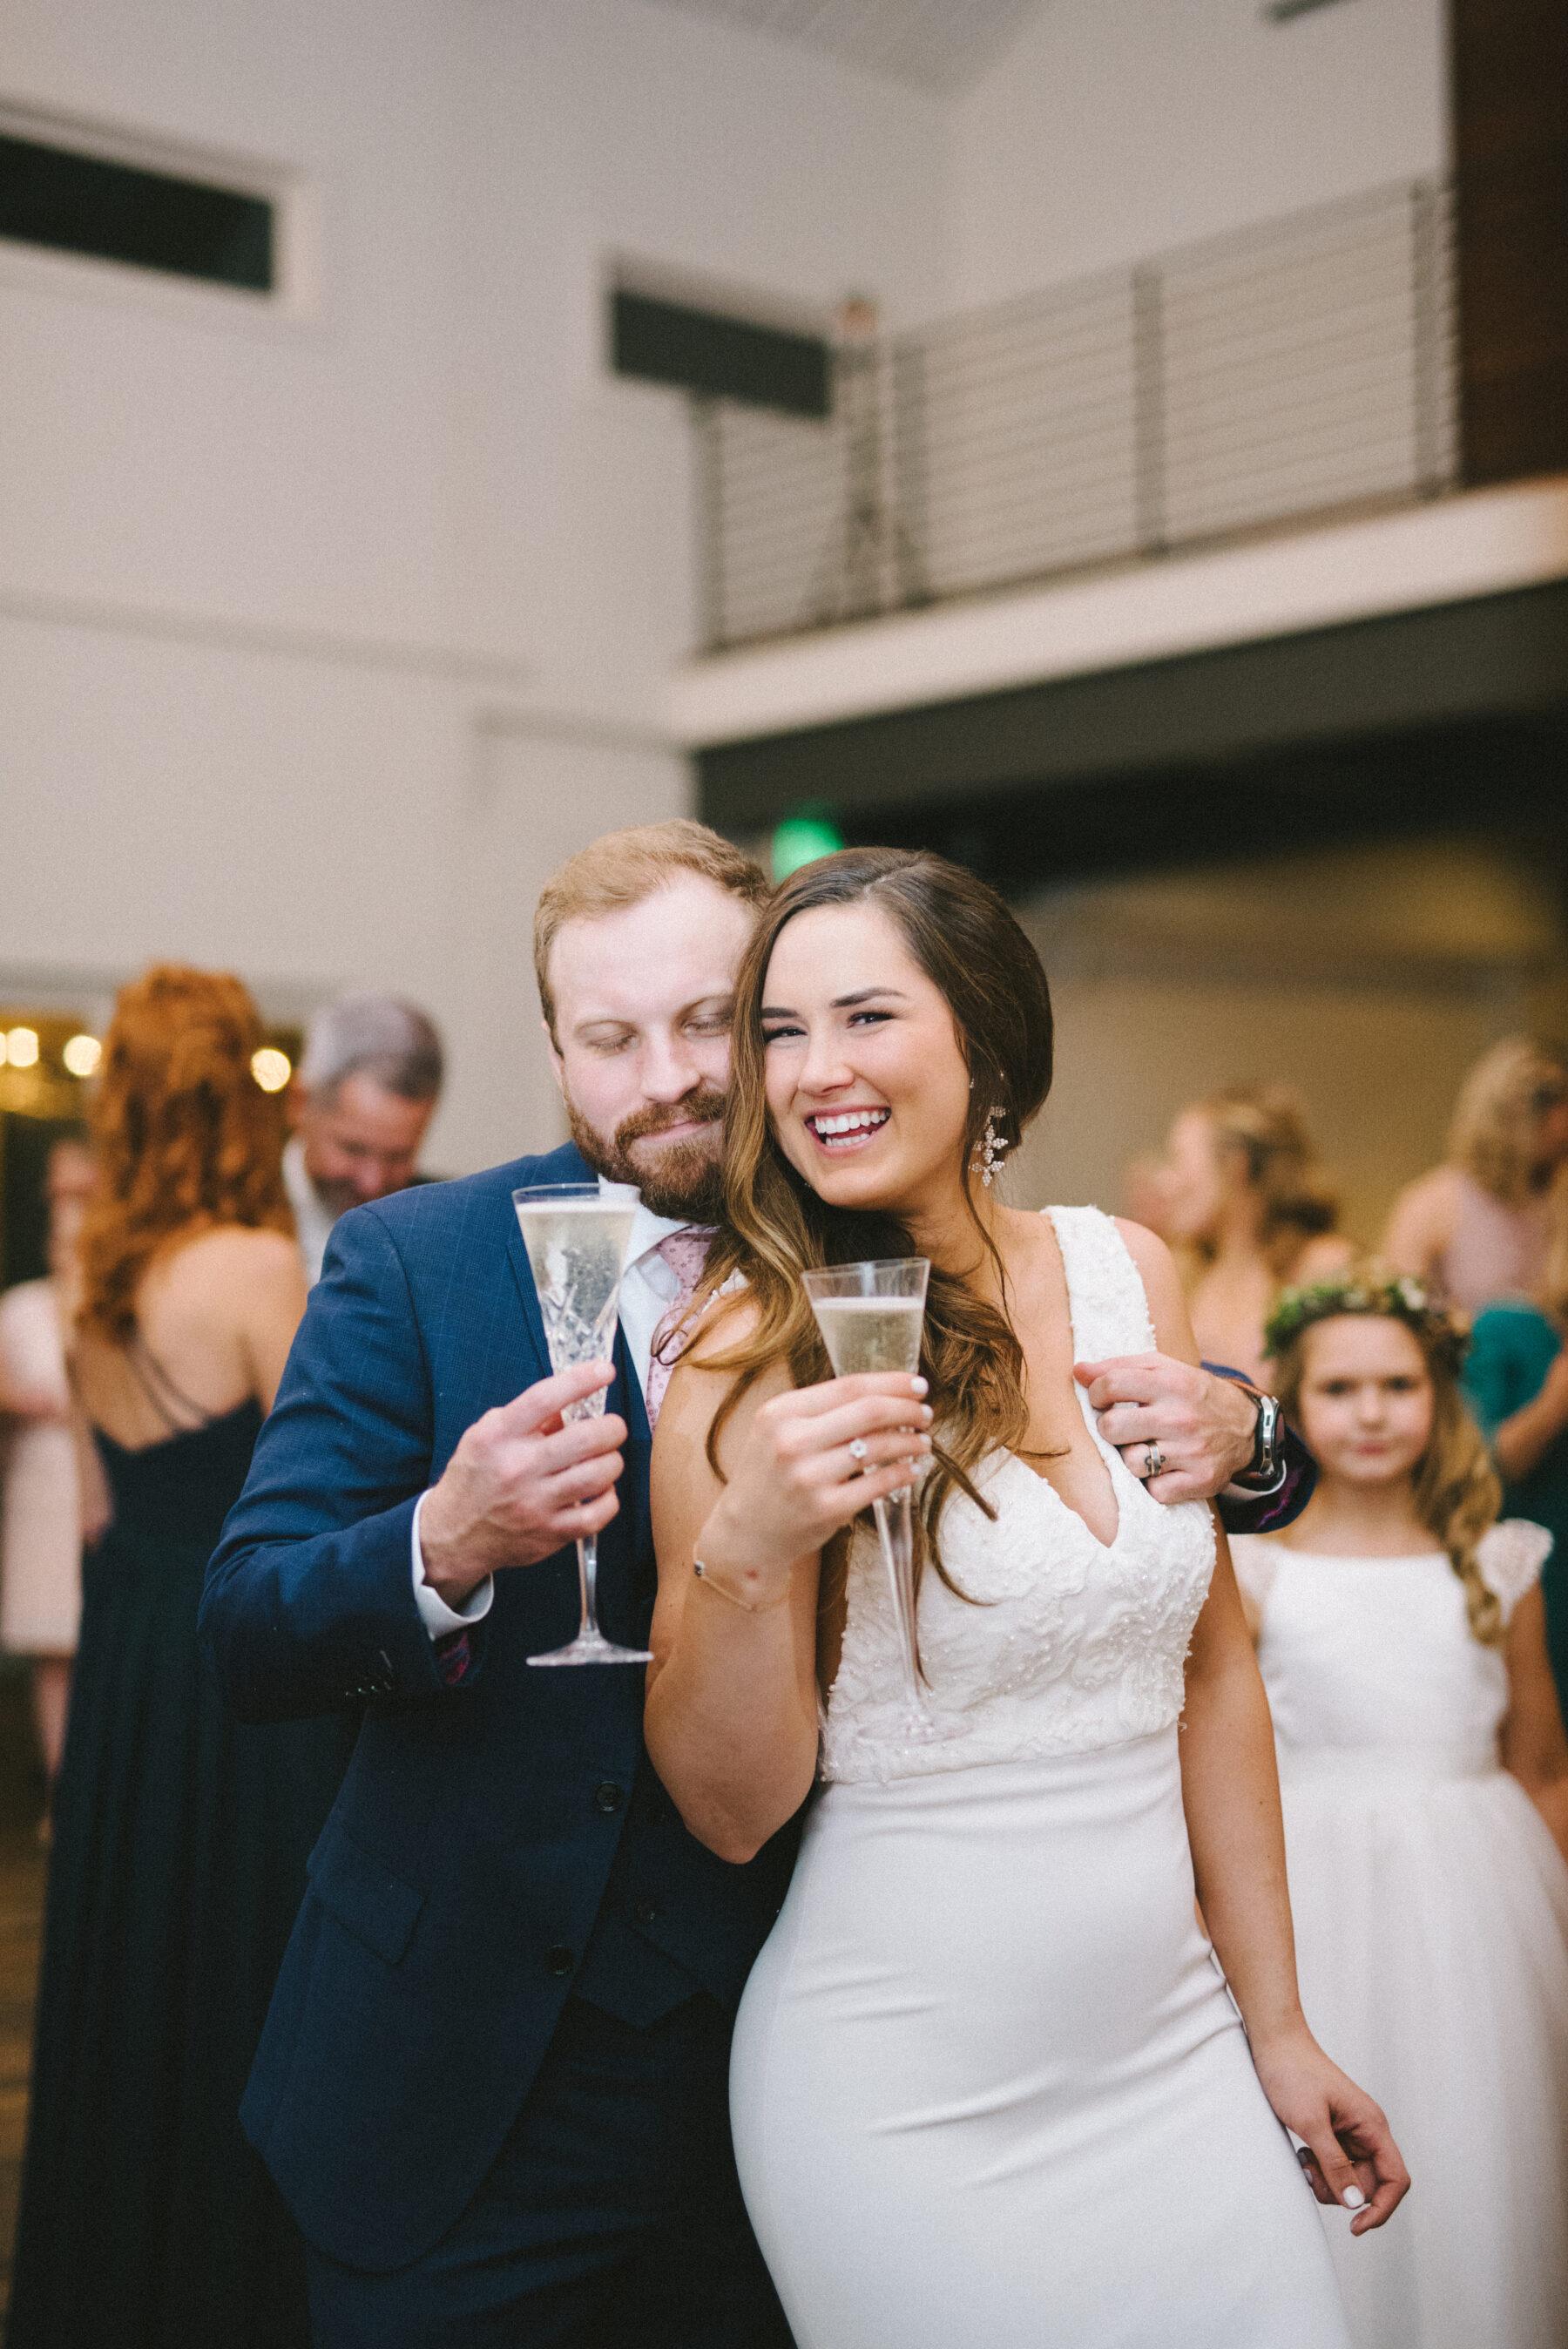 Kera Photography | Nashville Bride Guide